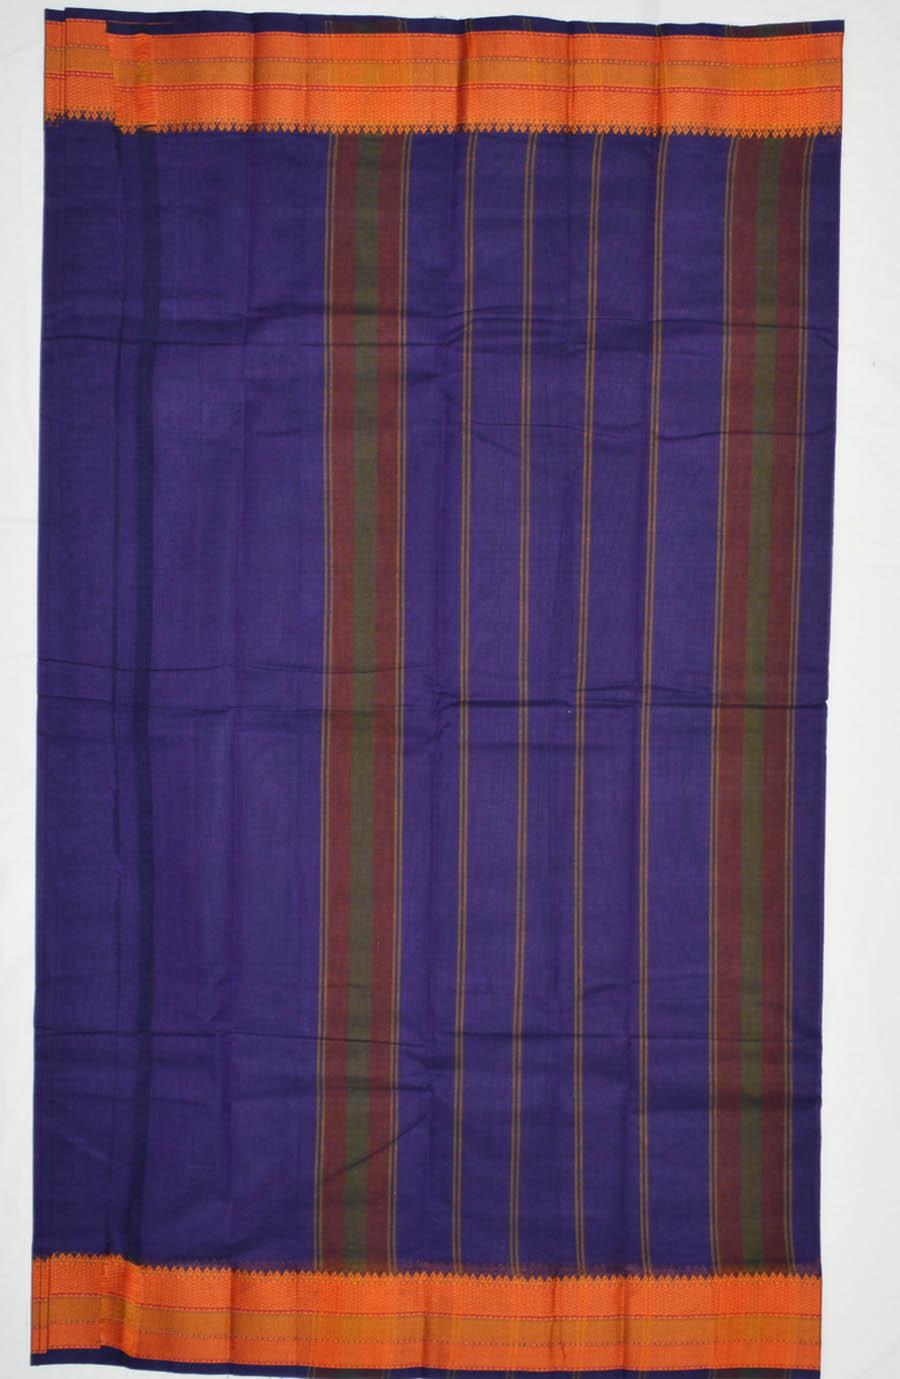 Kanchi Cotton 3731